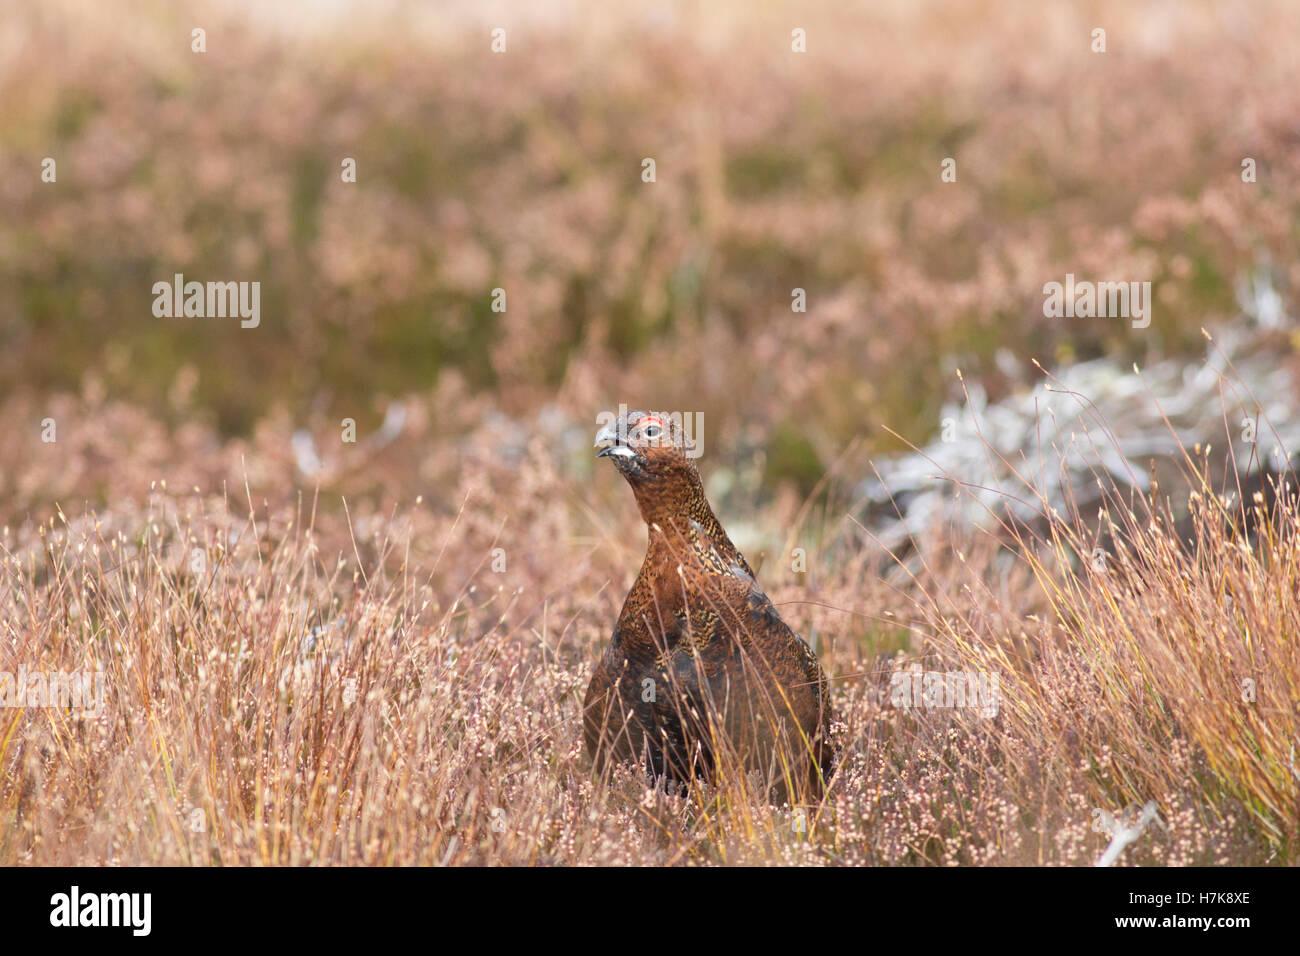 Male Red grouse (Lagopus lagopus scotica), Highlands, Scotland, UK - Stock Image